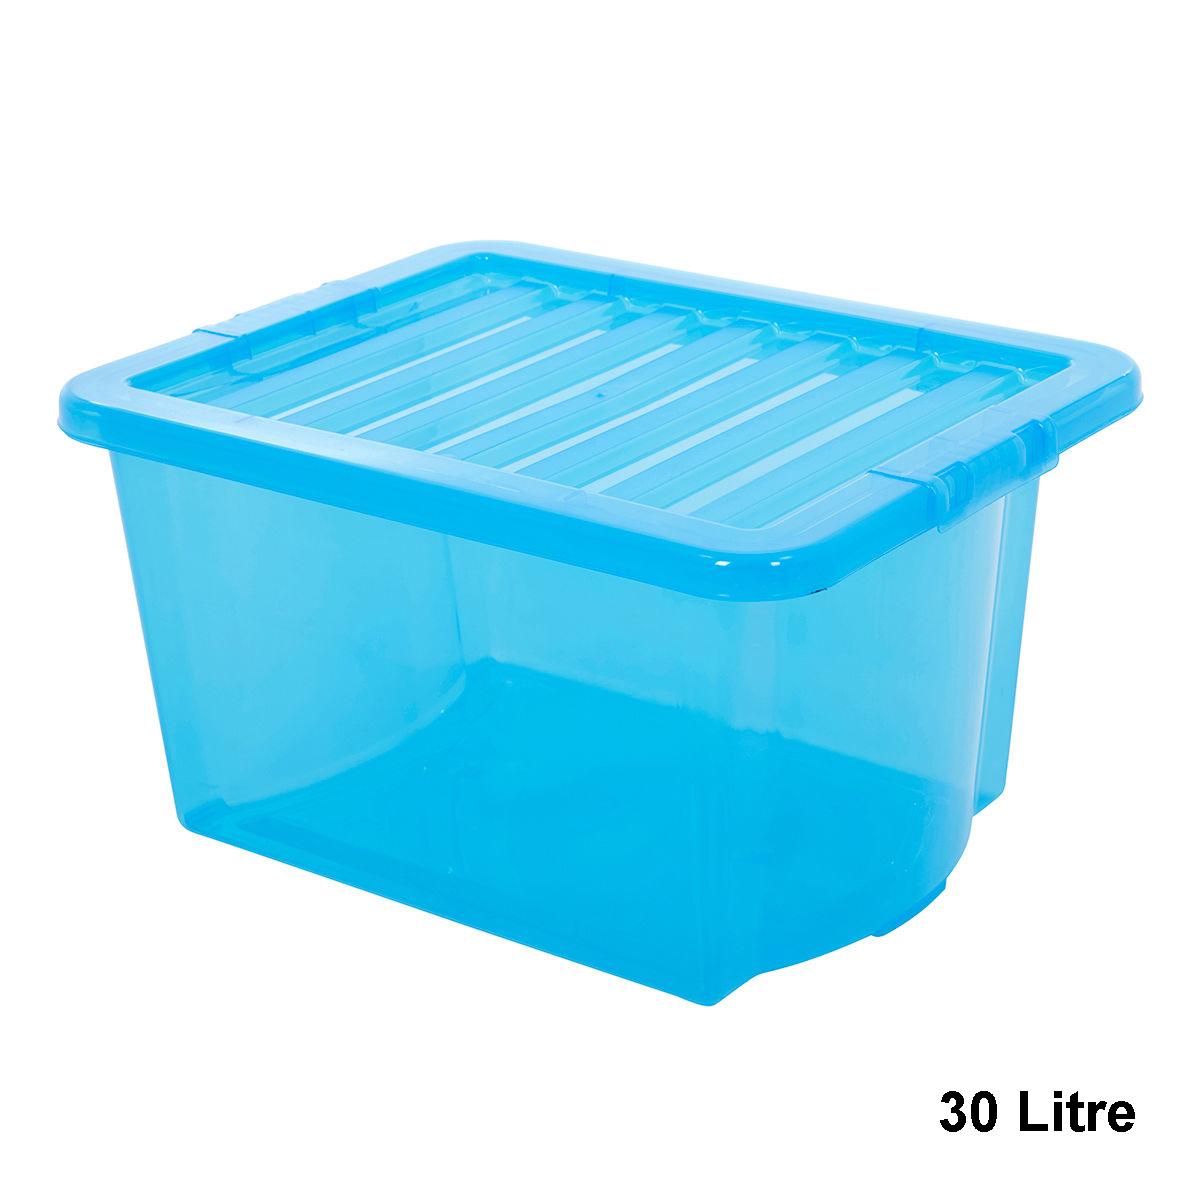 how to cut plastic storage box